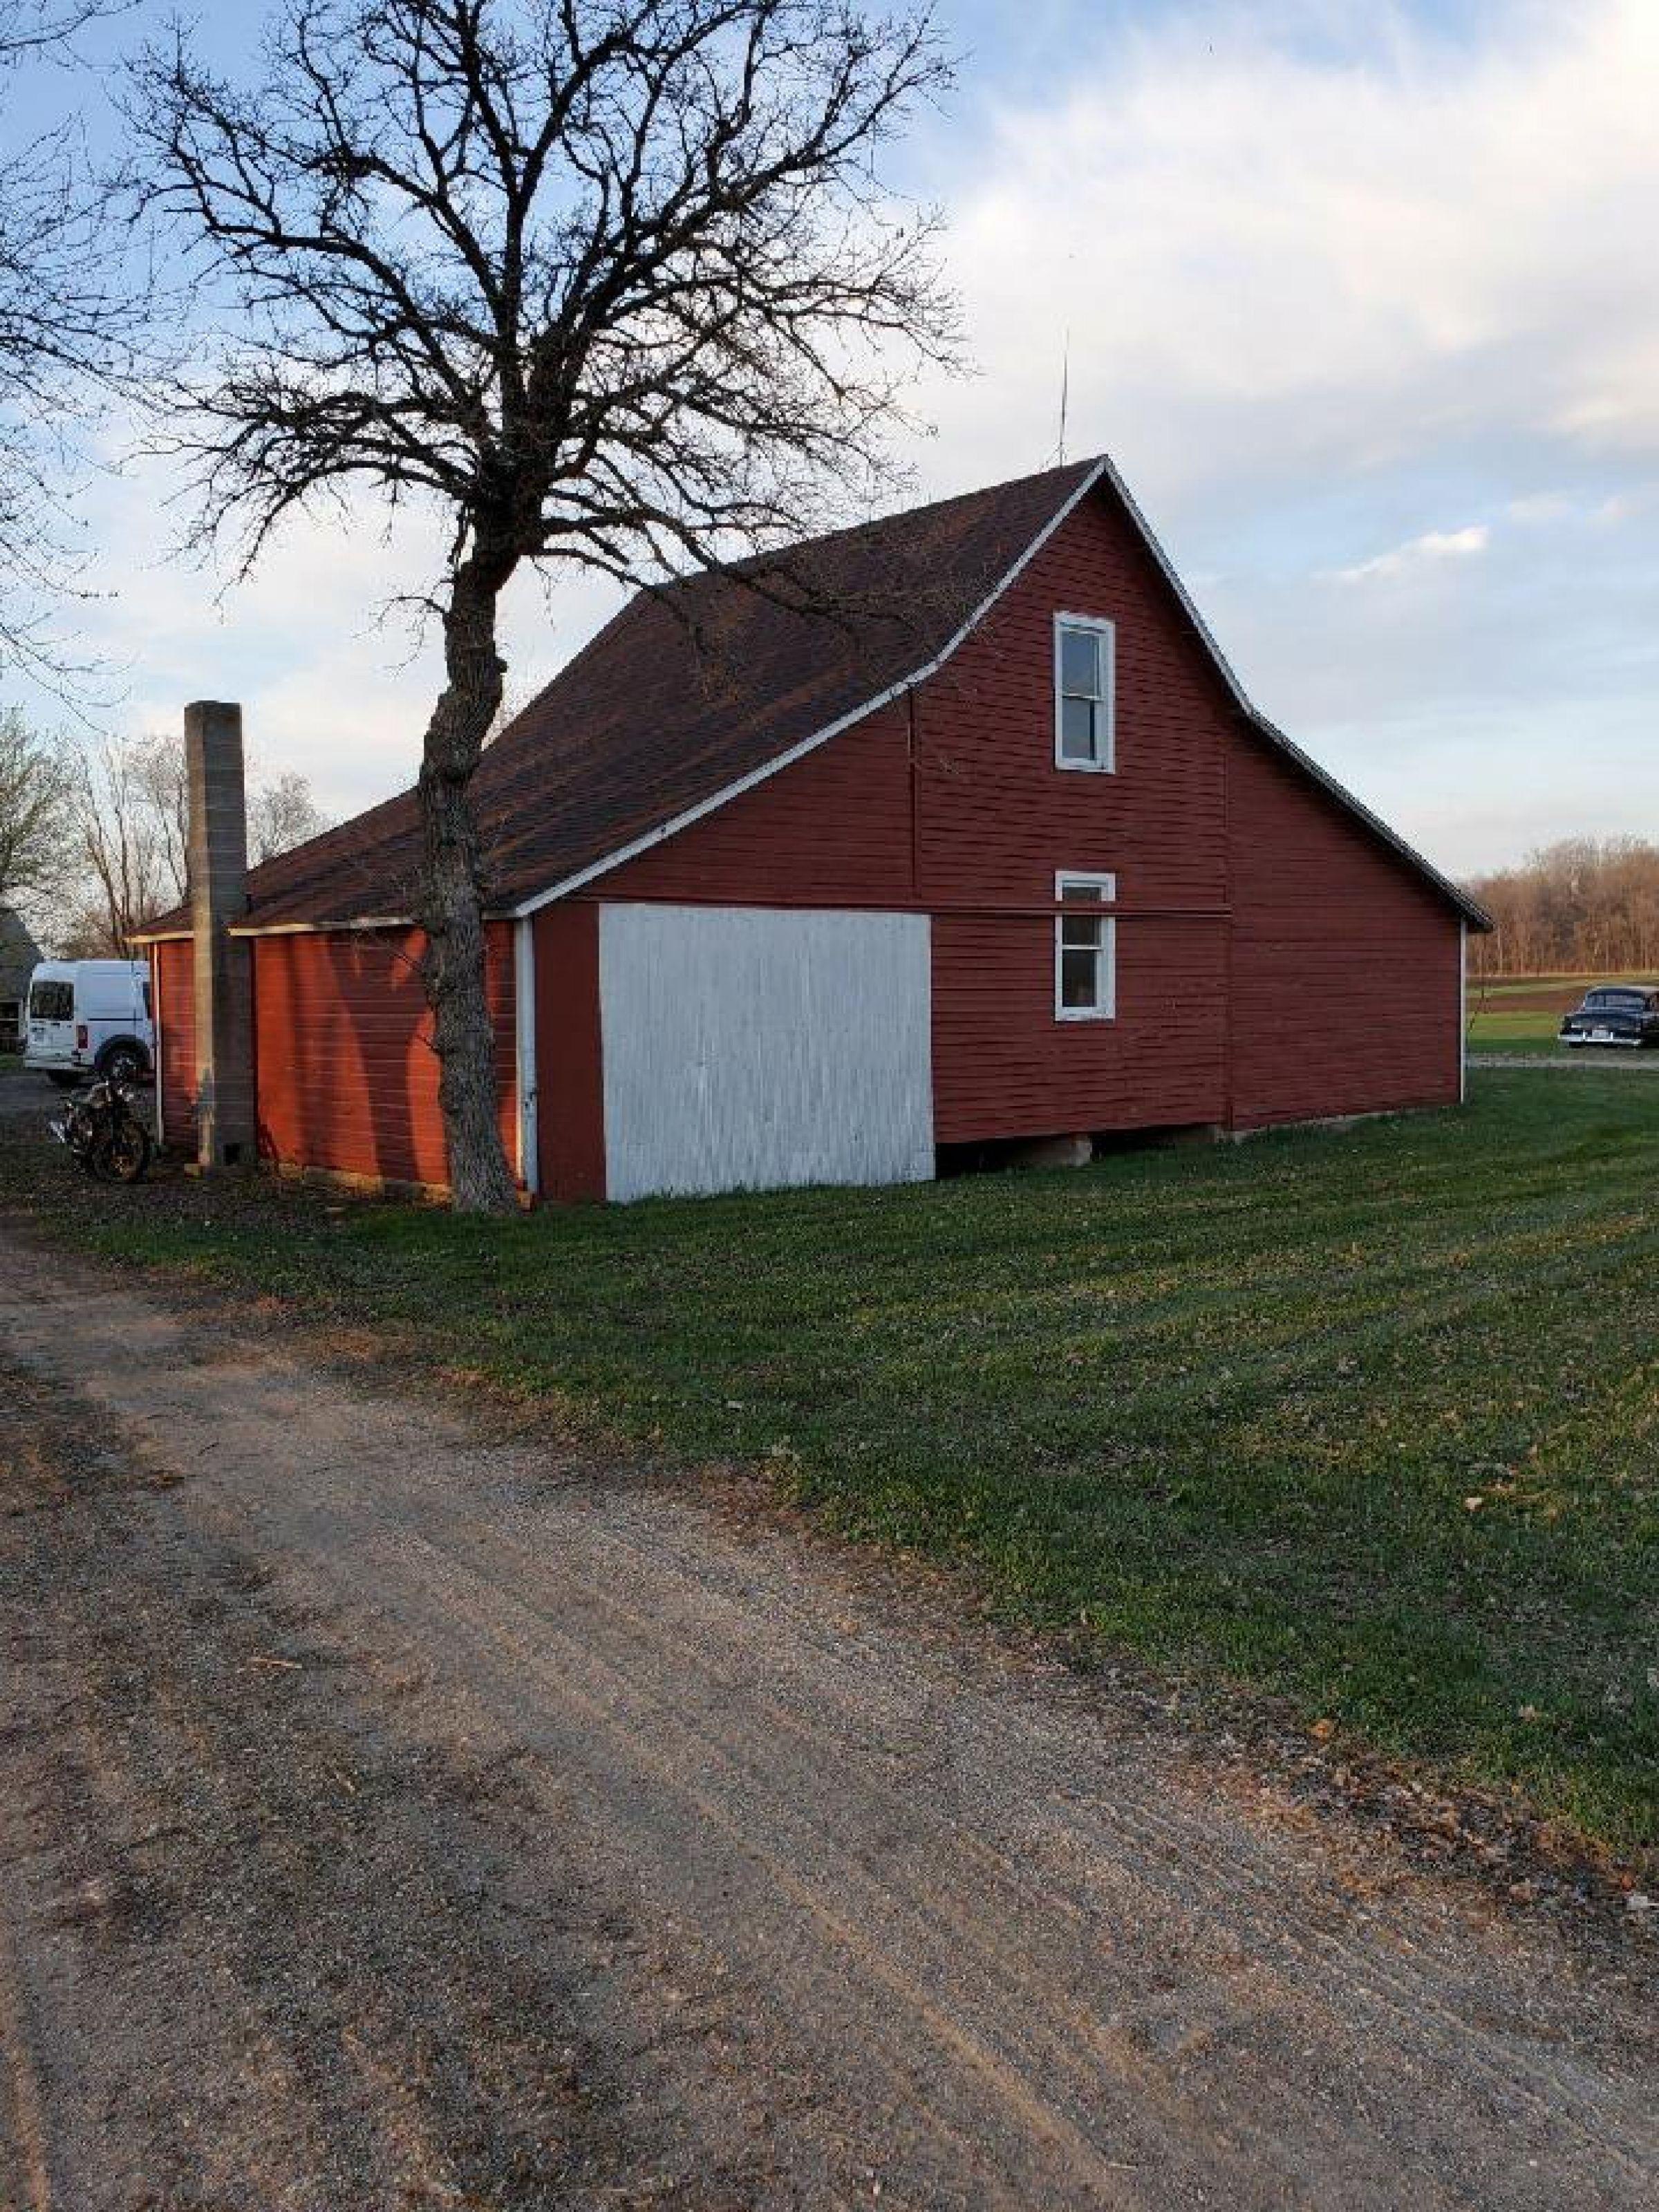 residential-land-mcleod-county-minnesota-80-acres-listing-number-15182-13-2020-09-23-163834.jpeg